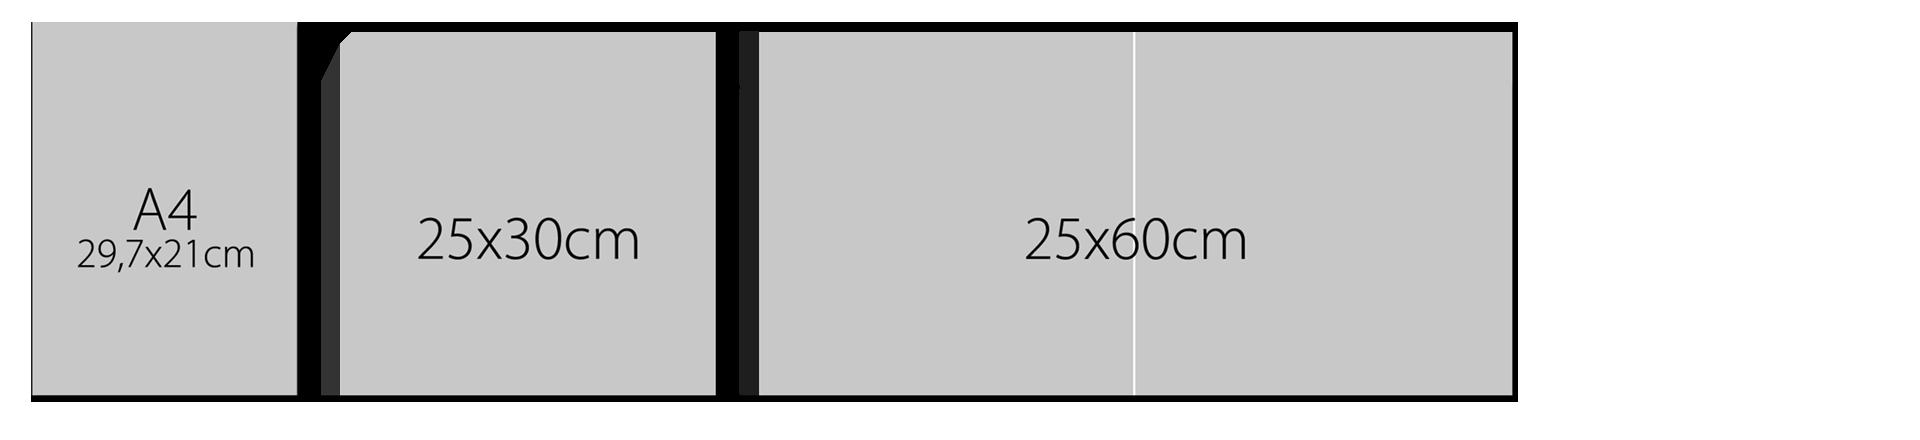 25x30